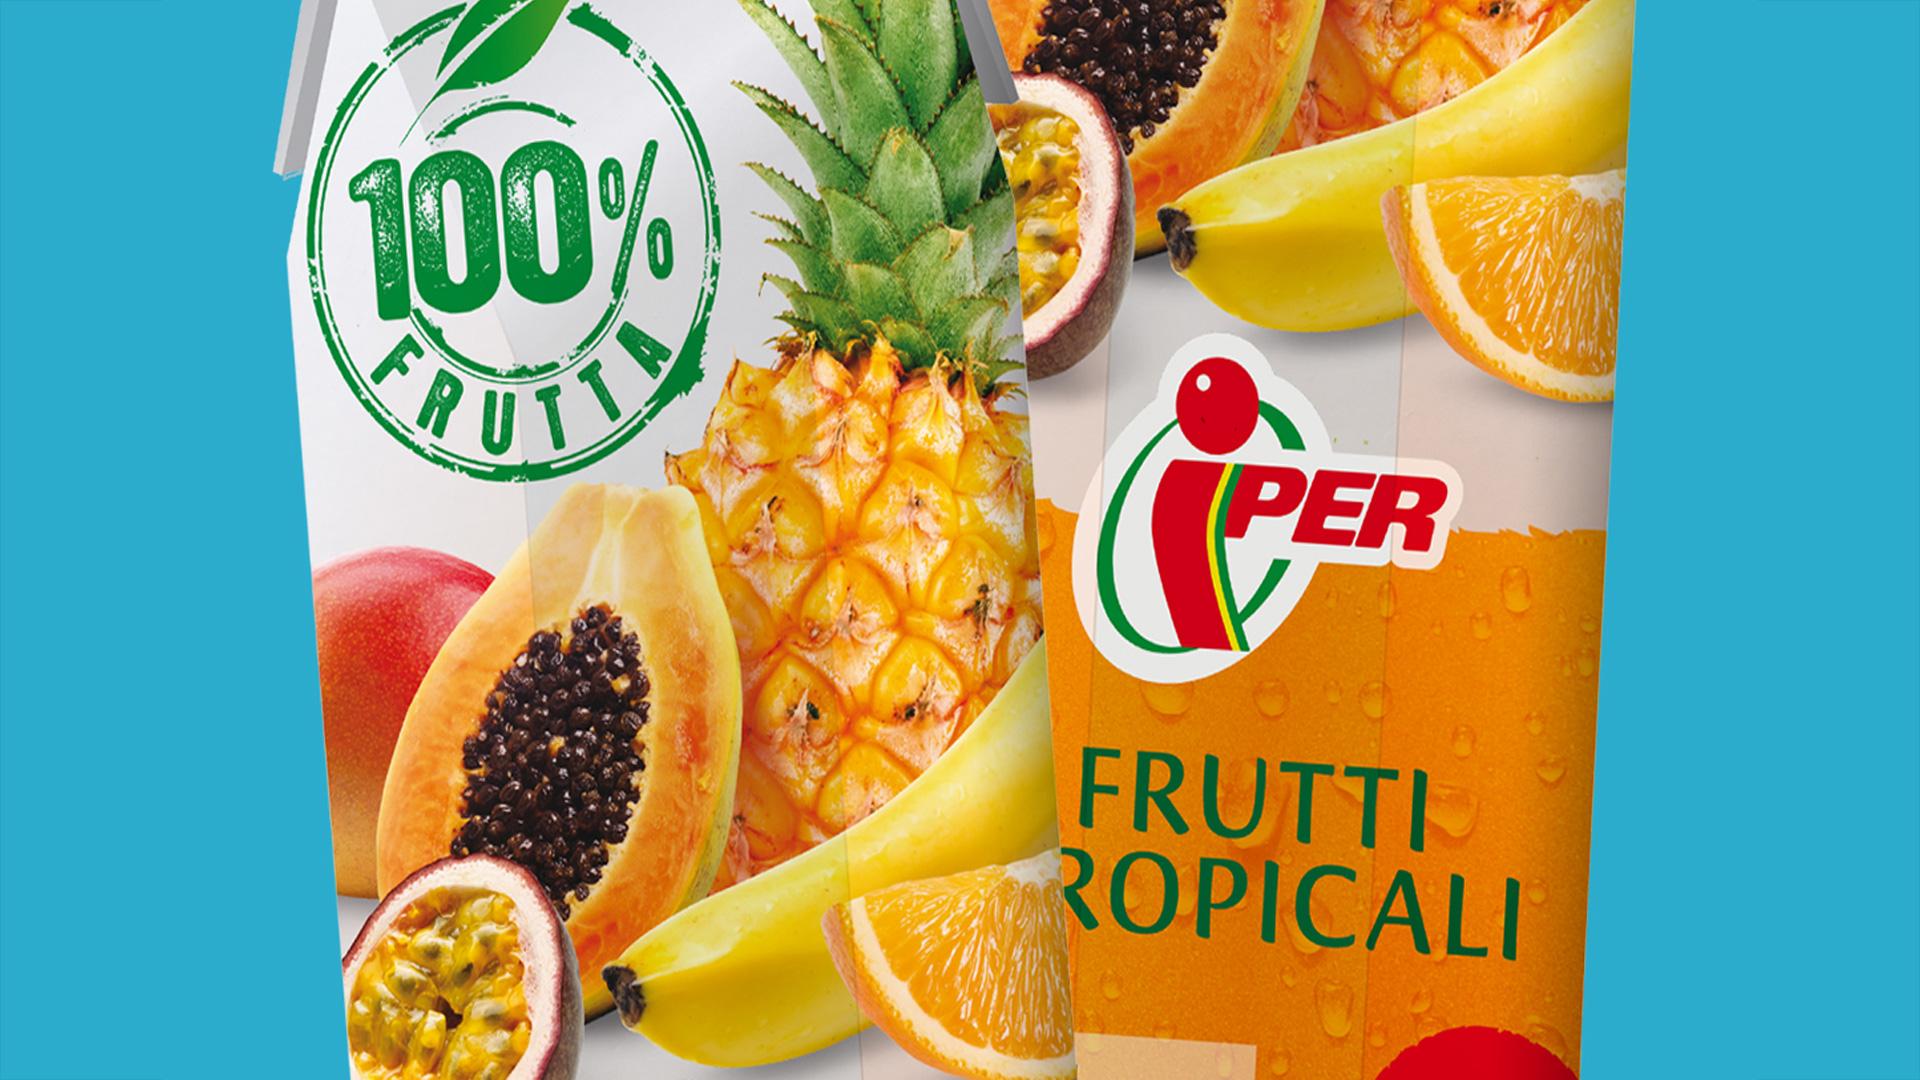 Iper-Rba-Design-005